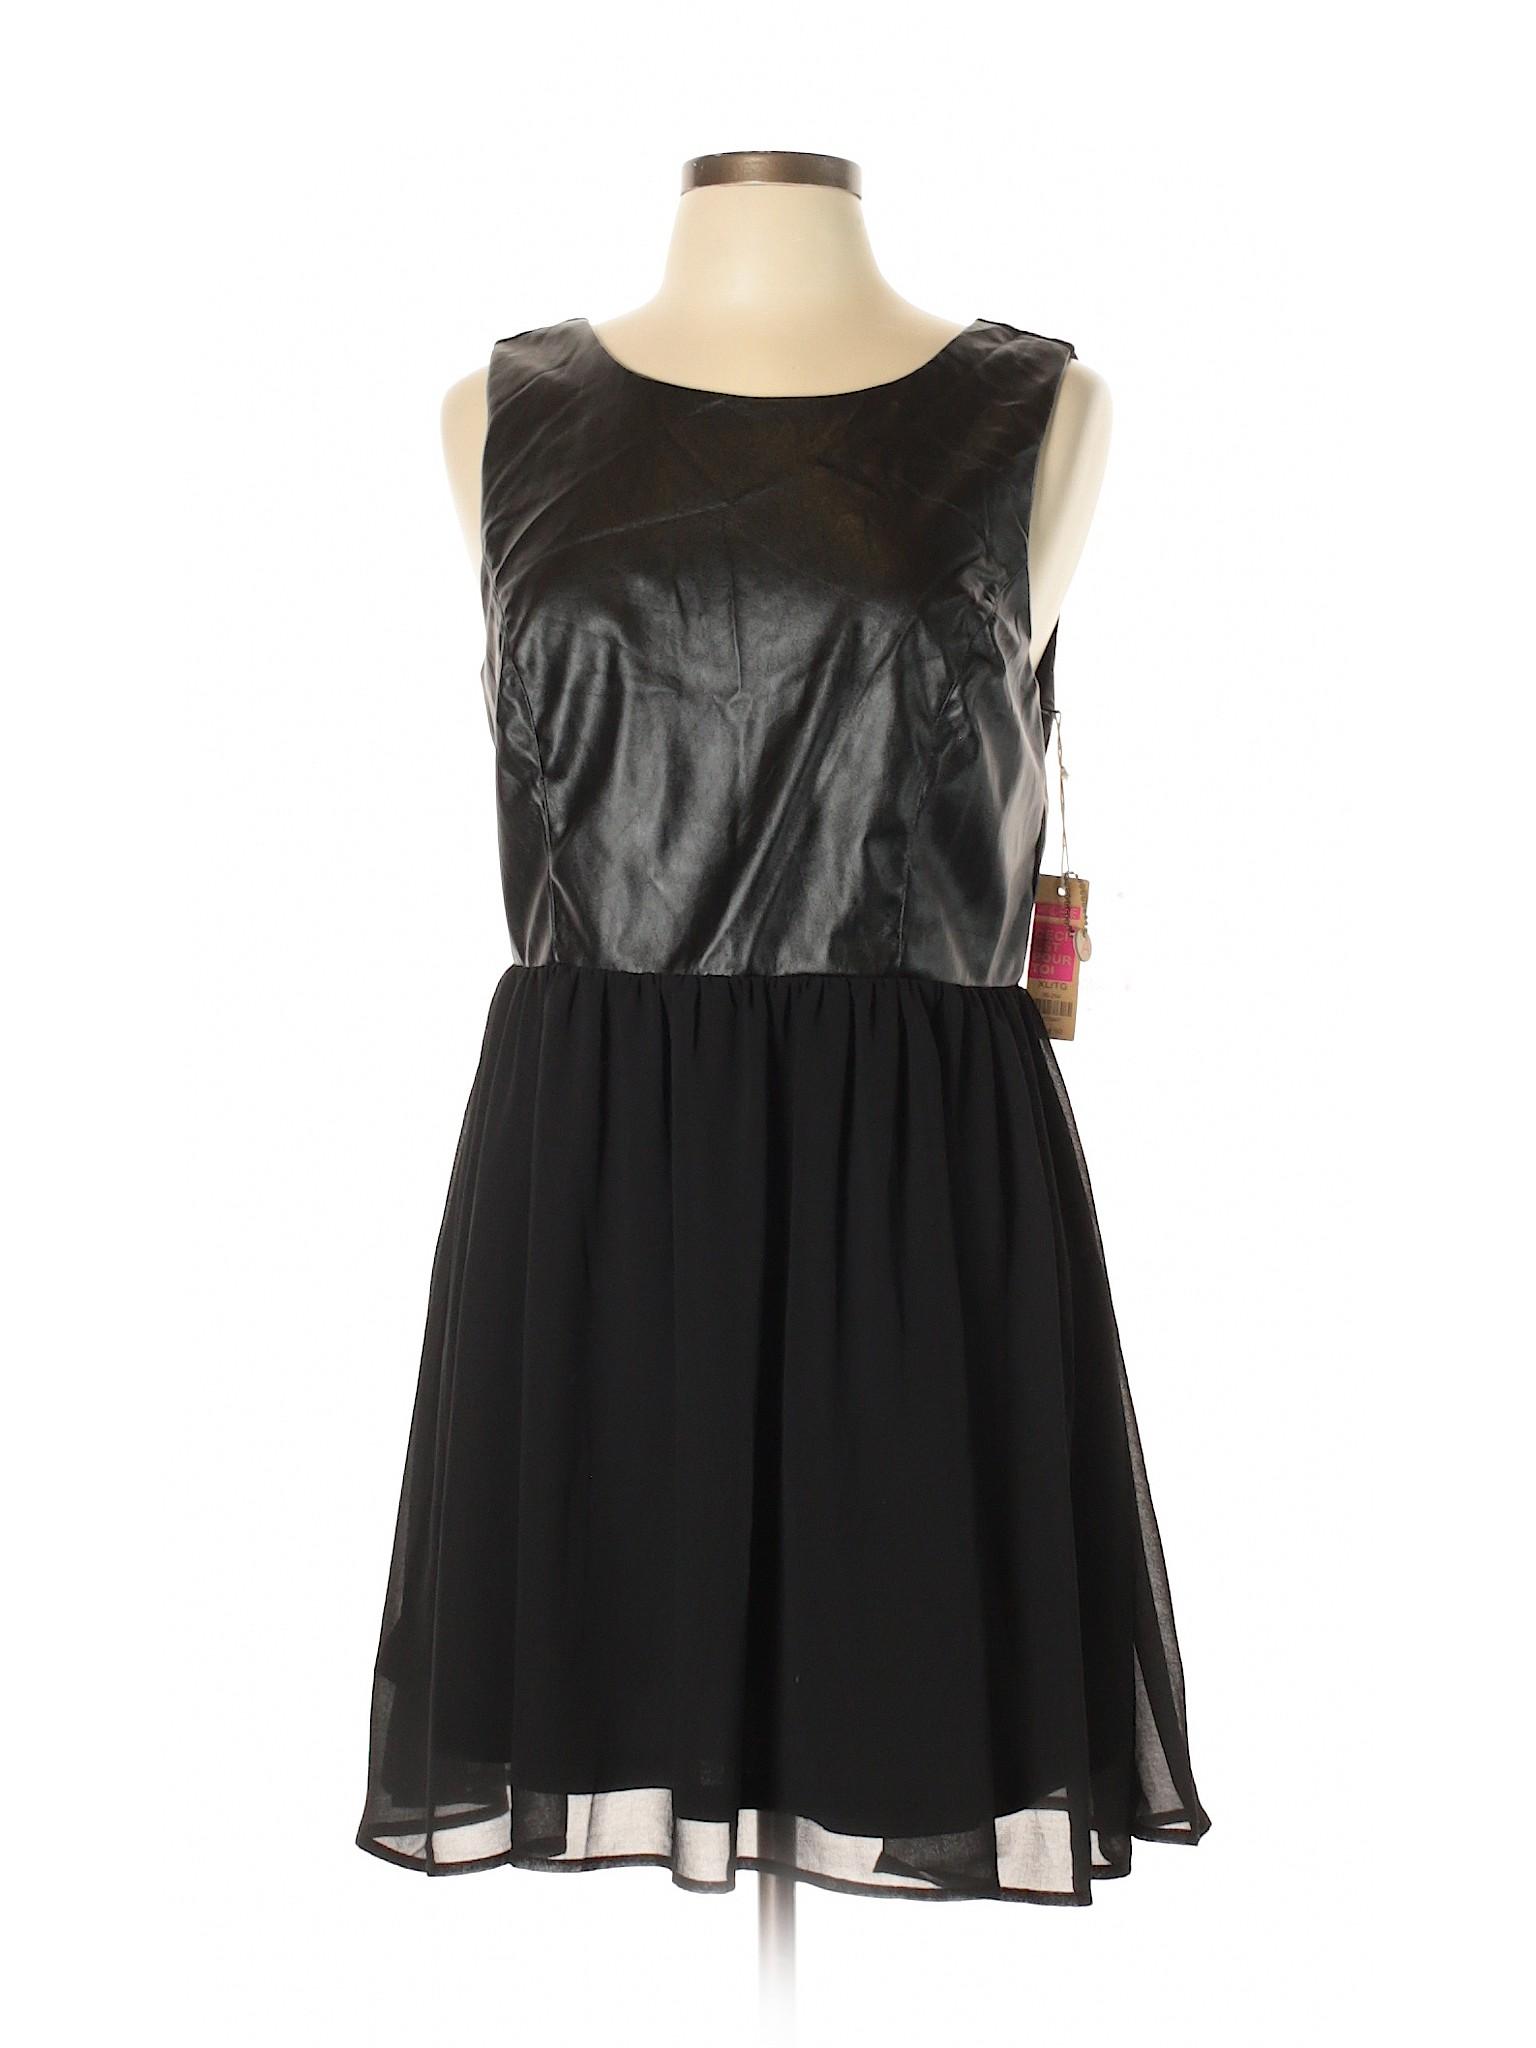 Boutique Boutique Ardene winter Ardene Casual Casual Dress winter Boutique Dress 1O1w7